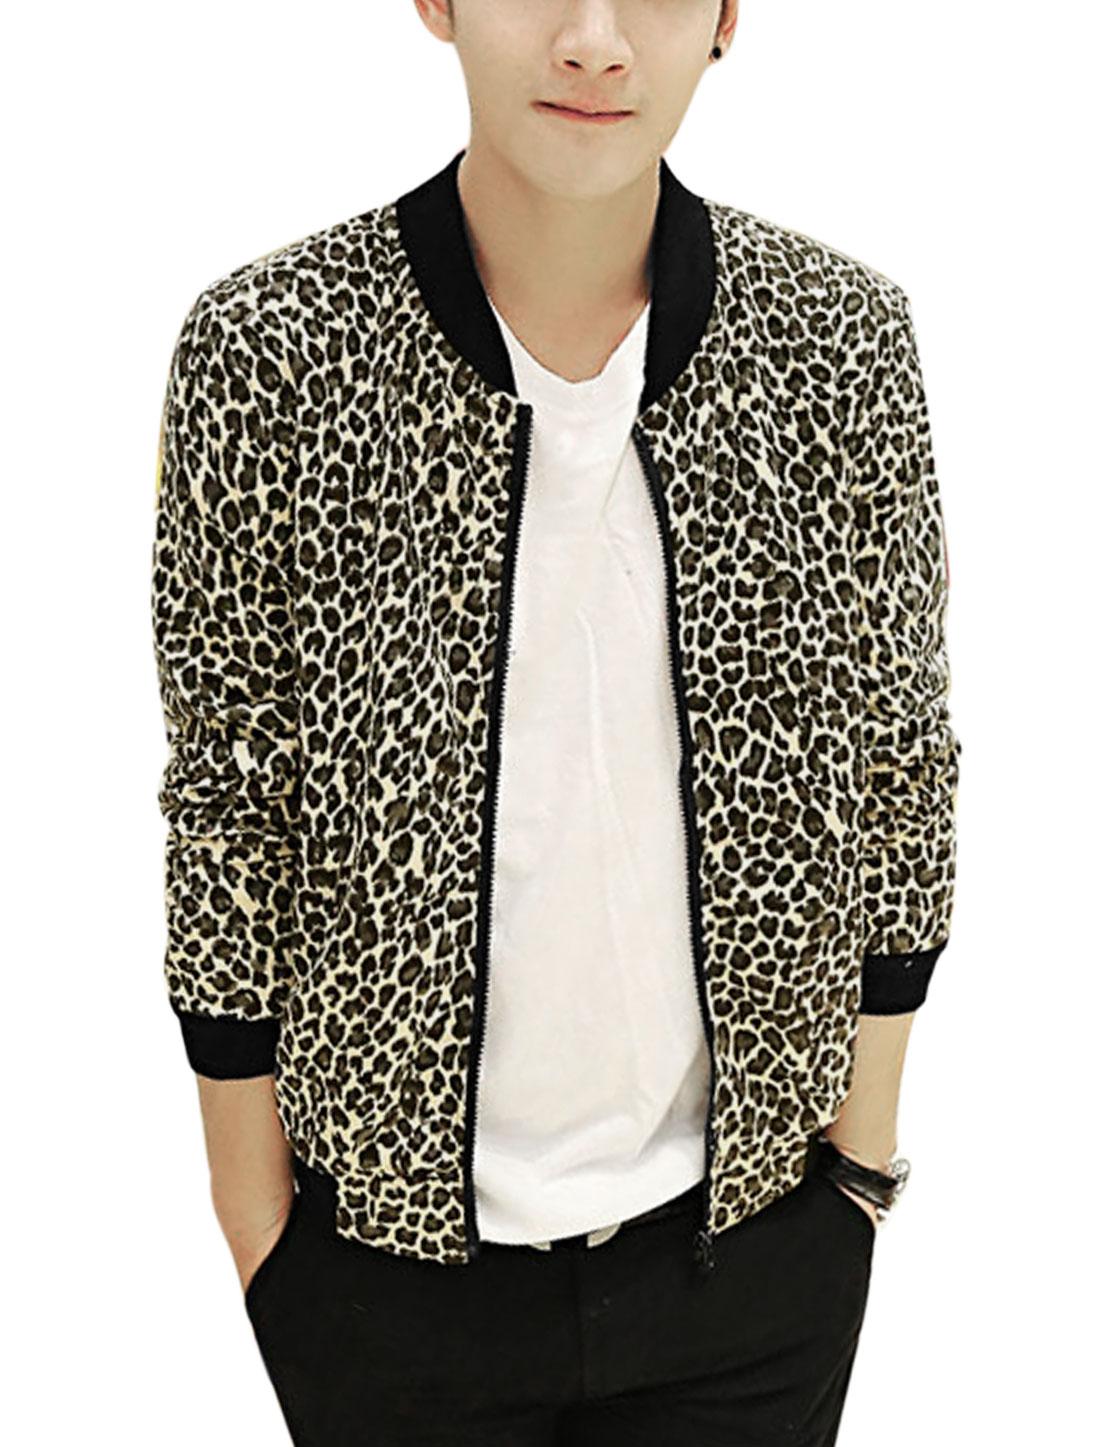 Men Rib Knit Collar Allover Leopard Print Slant Pockets Fashion Jacket Beige Steel Blue S